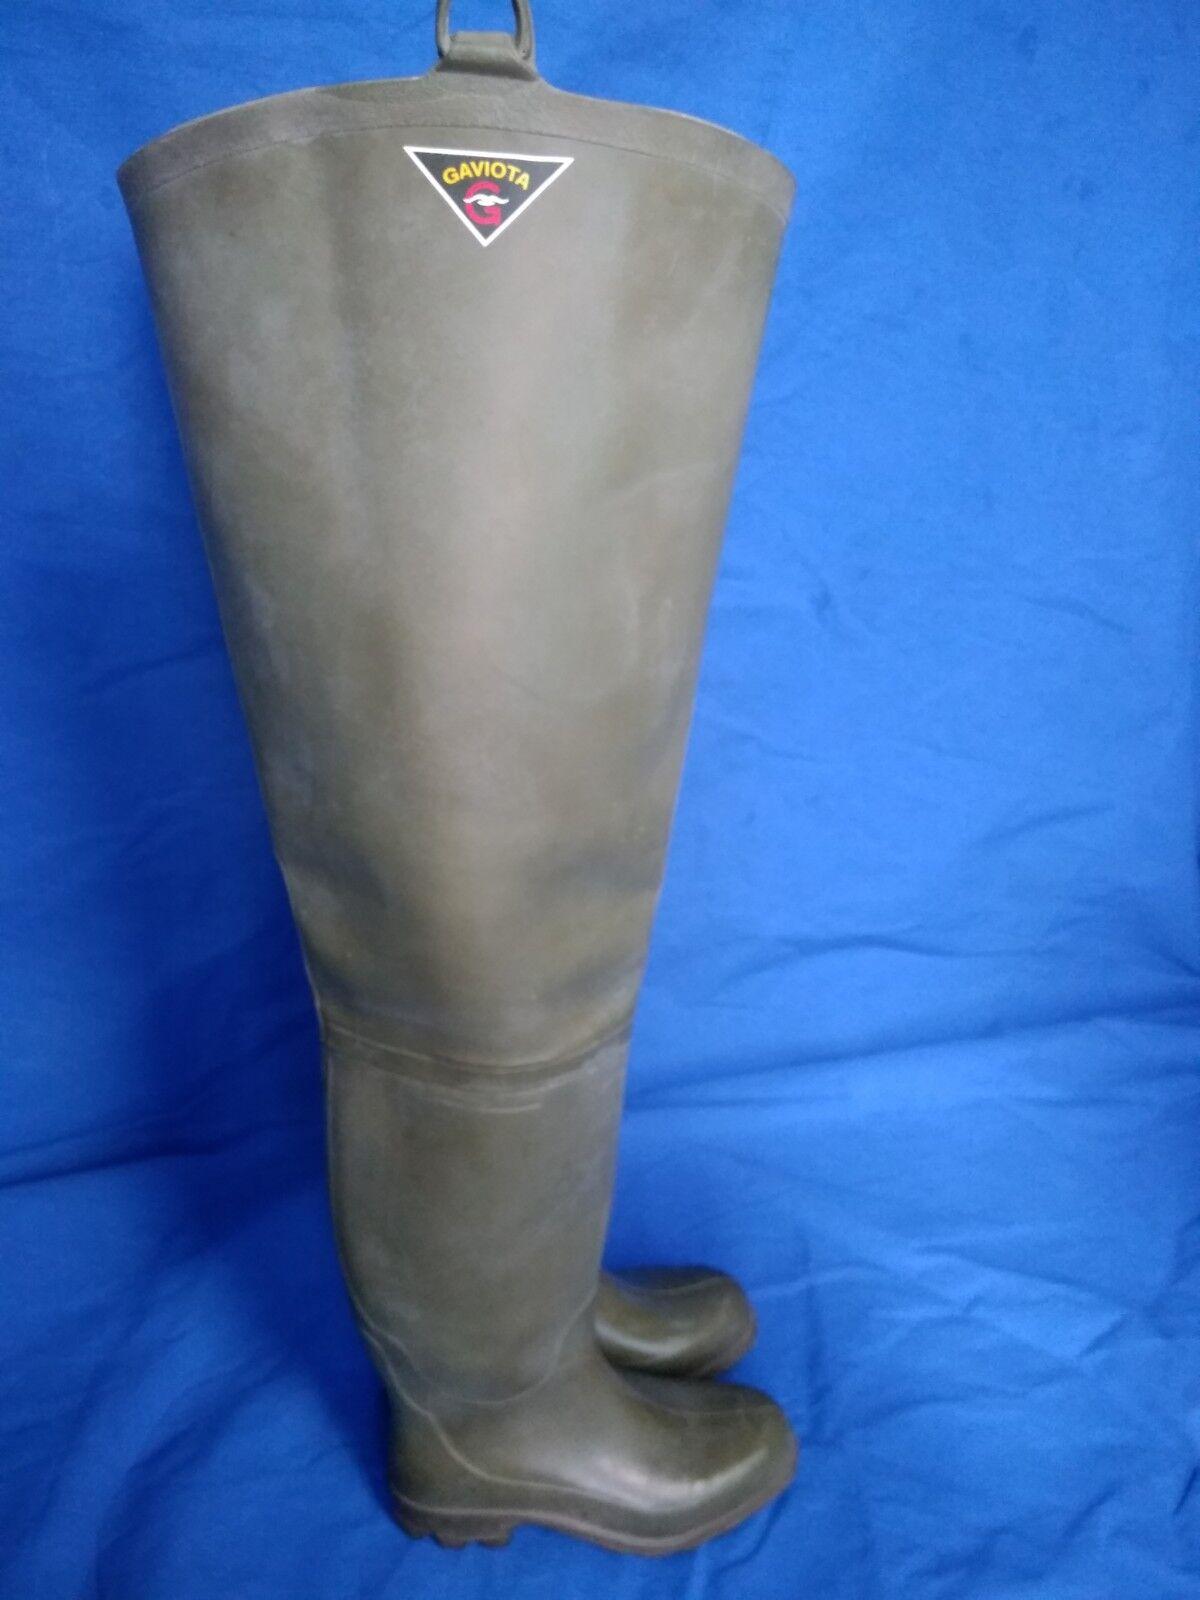 Rubber boots wader gummi botas altas de pesca,marca GAVIOTA